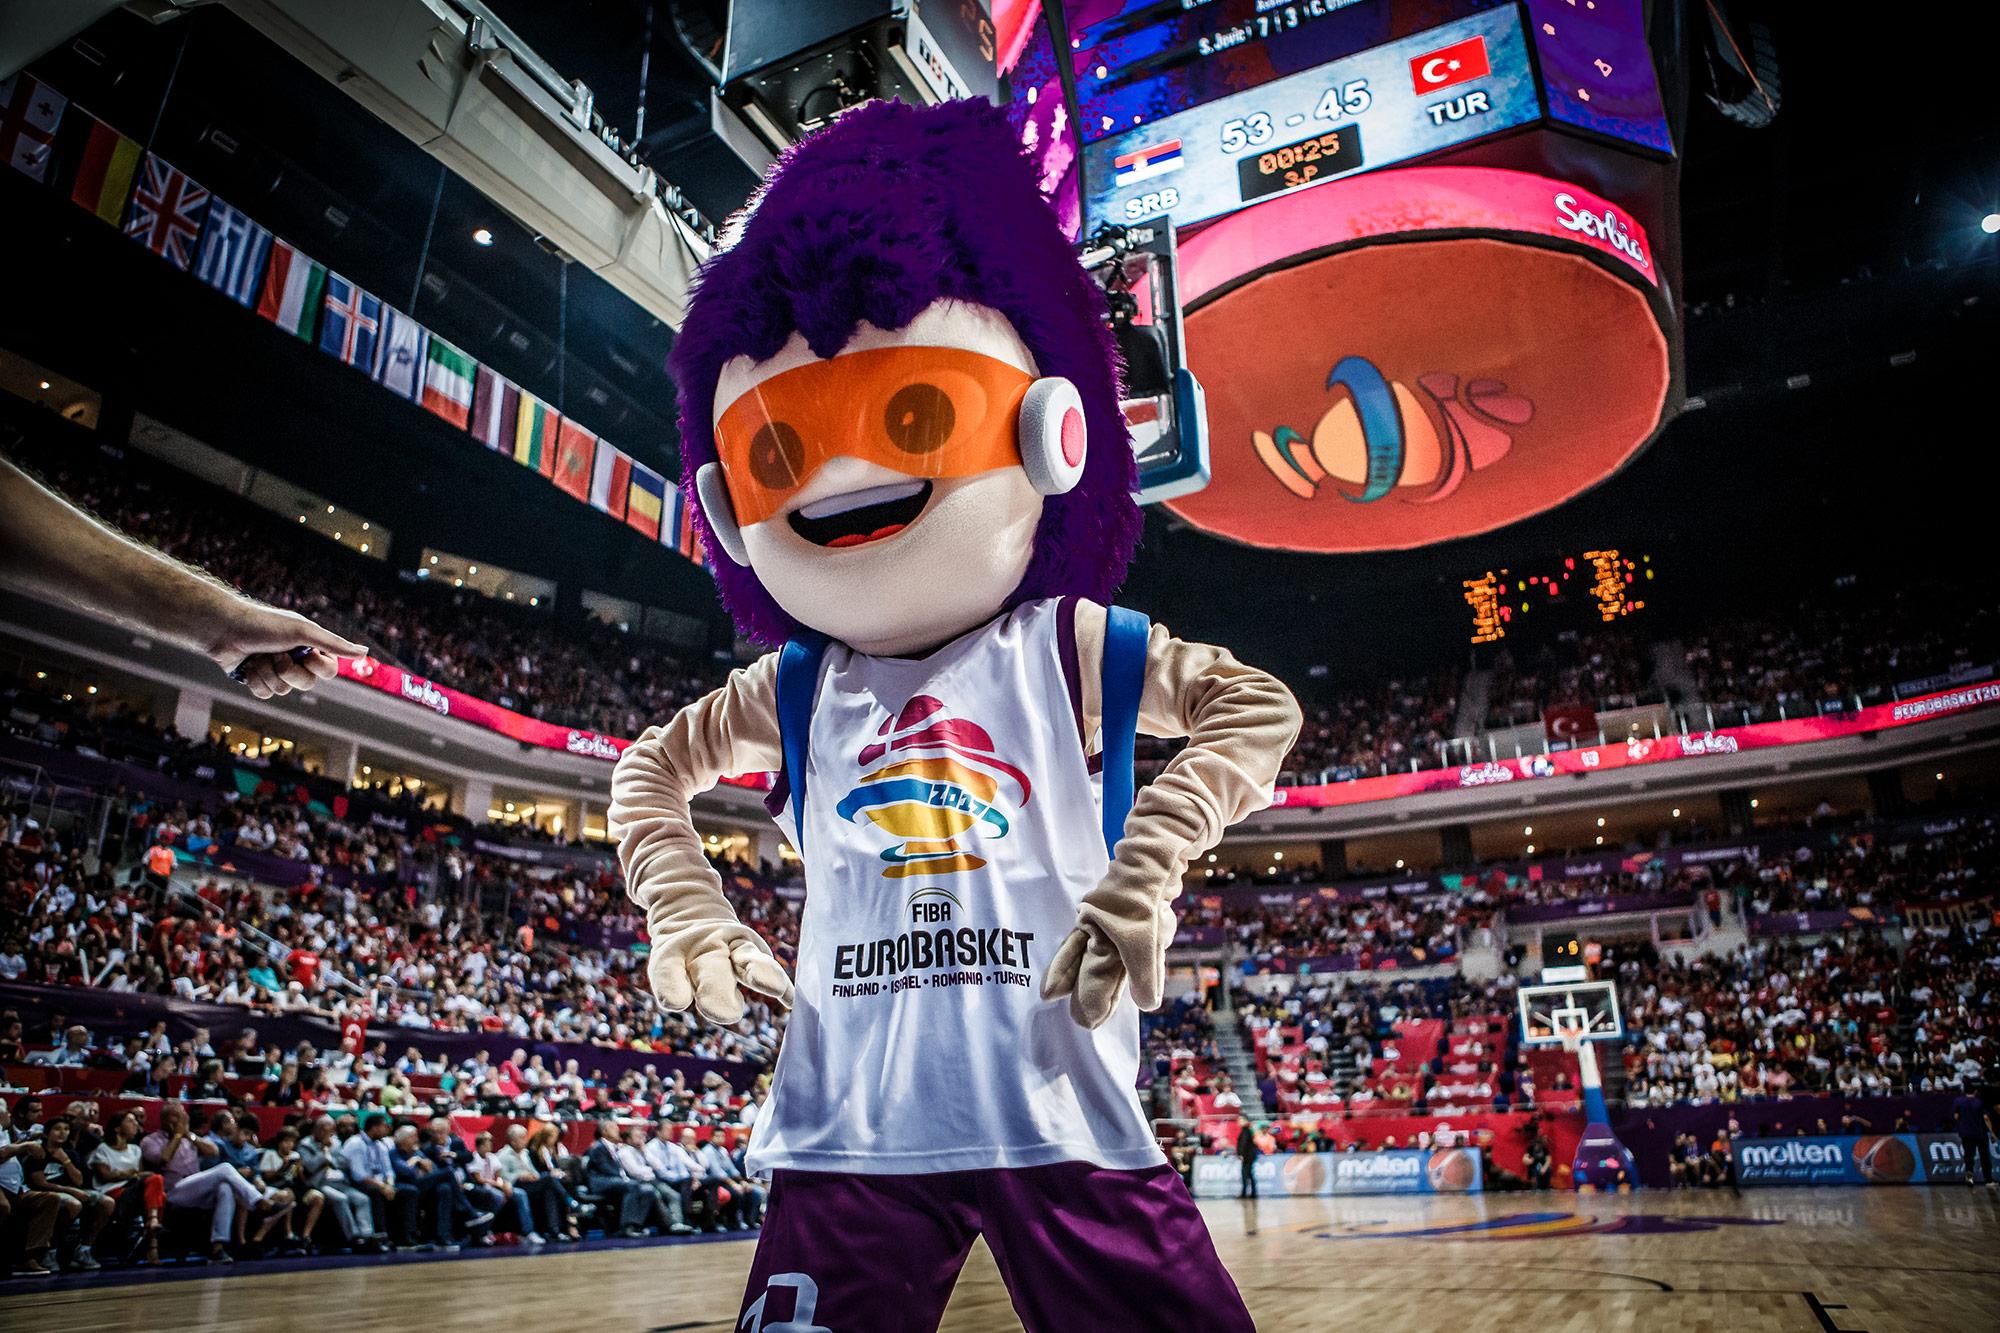 Euro Basket 2017 Mascot